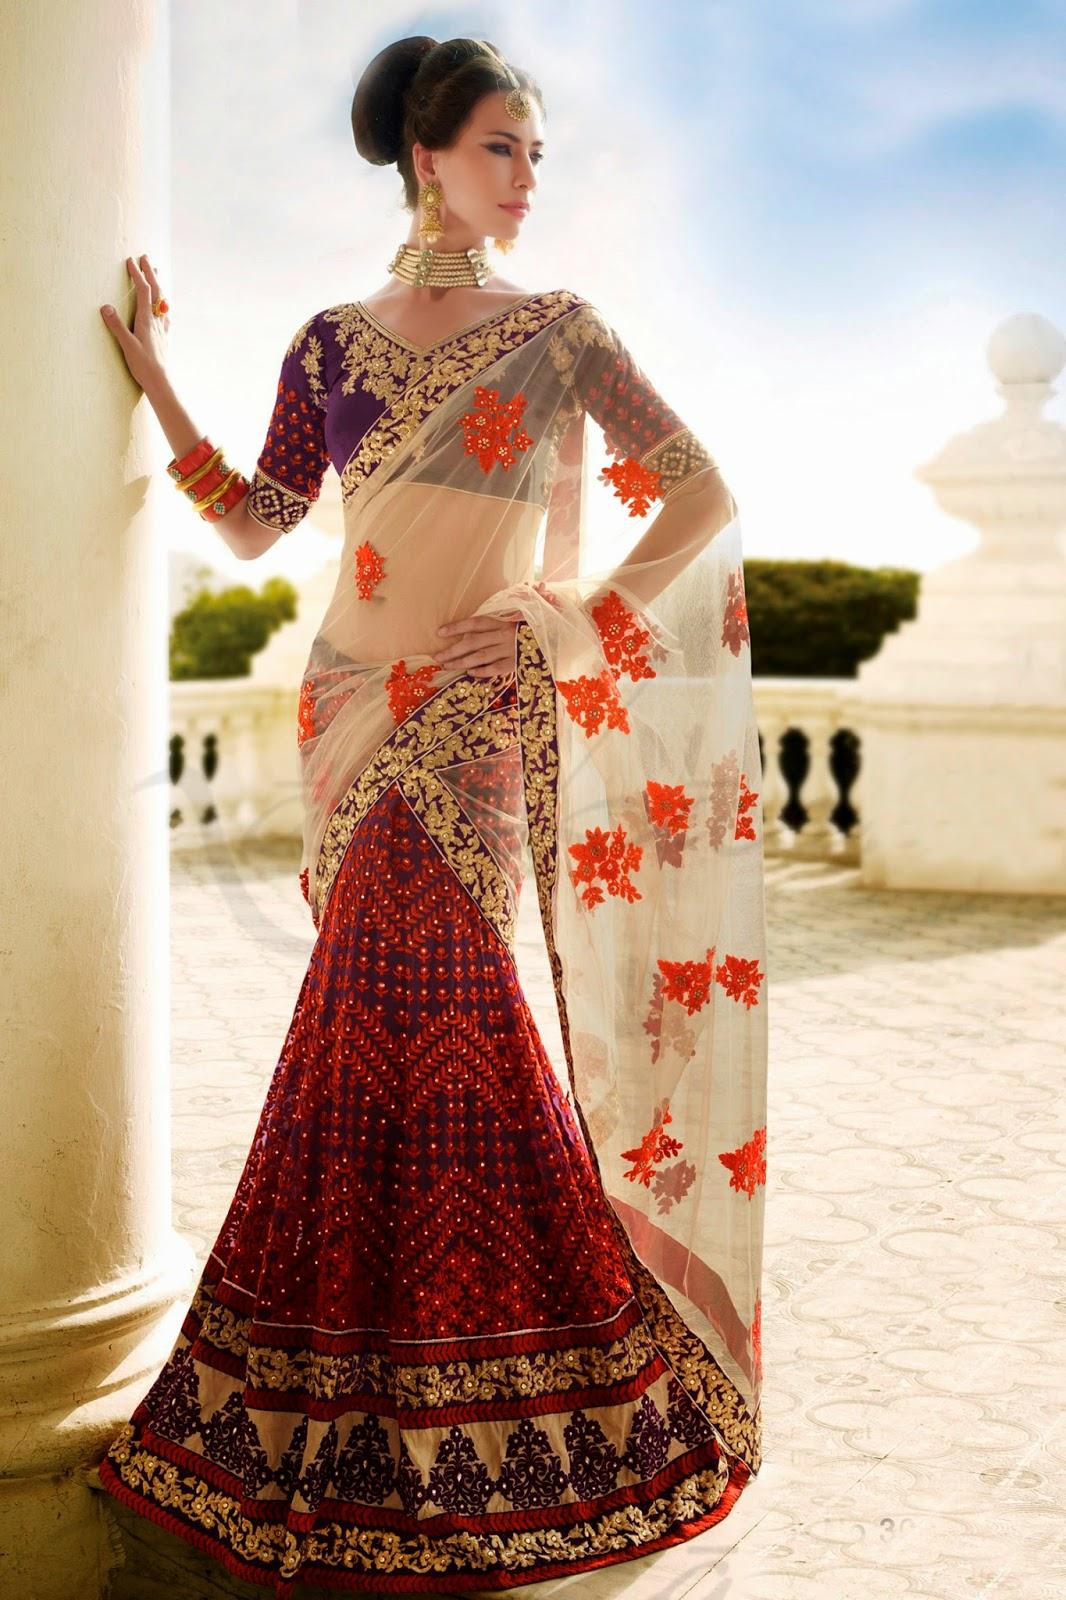 Bridal Lehenga for Wedding Perfect Wedding Outfits for